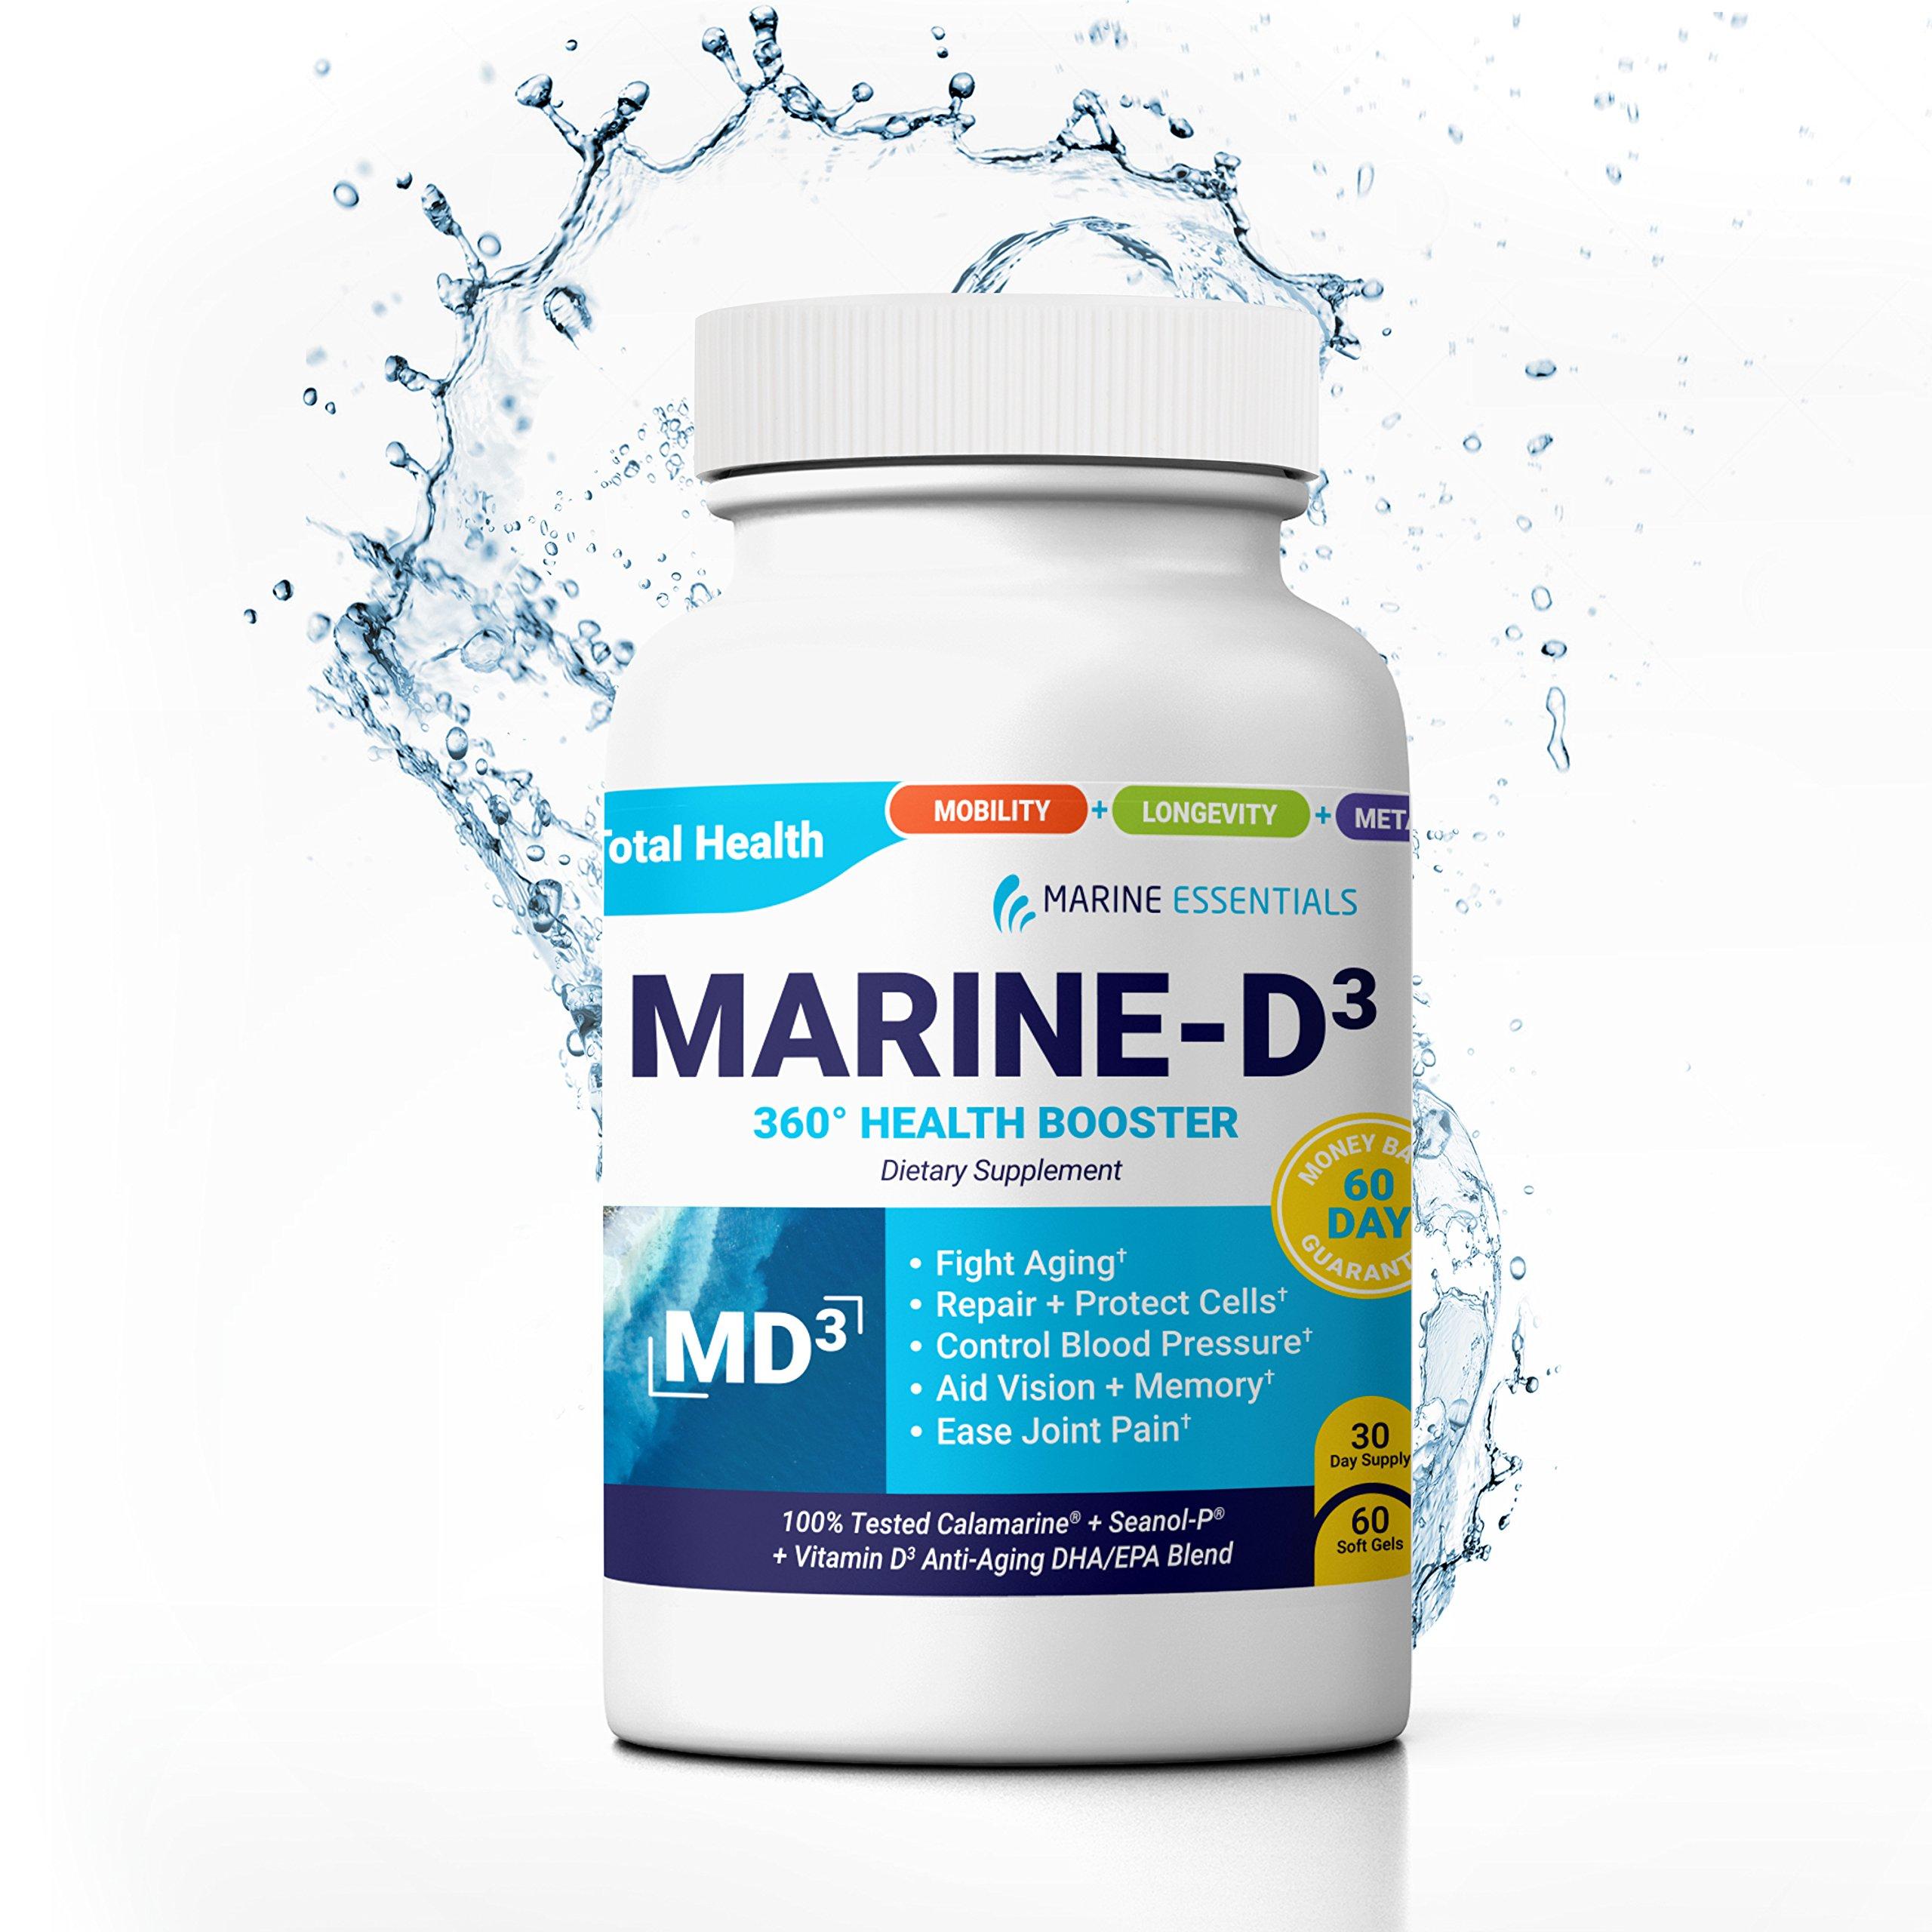 Marine Essentials Vitamin D3 Omega 3 Fish Oil - ''Marine-D3'' 340 mg Vitamin D3 DHA Anti Aging Omega 3 Fish Oil Dietary Supplement (60 Softgels) by Marine Essentials